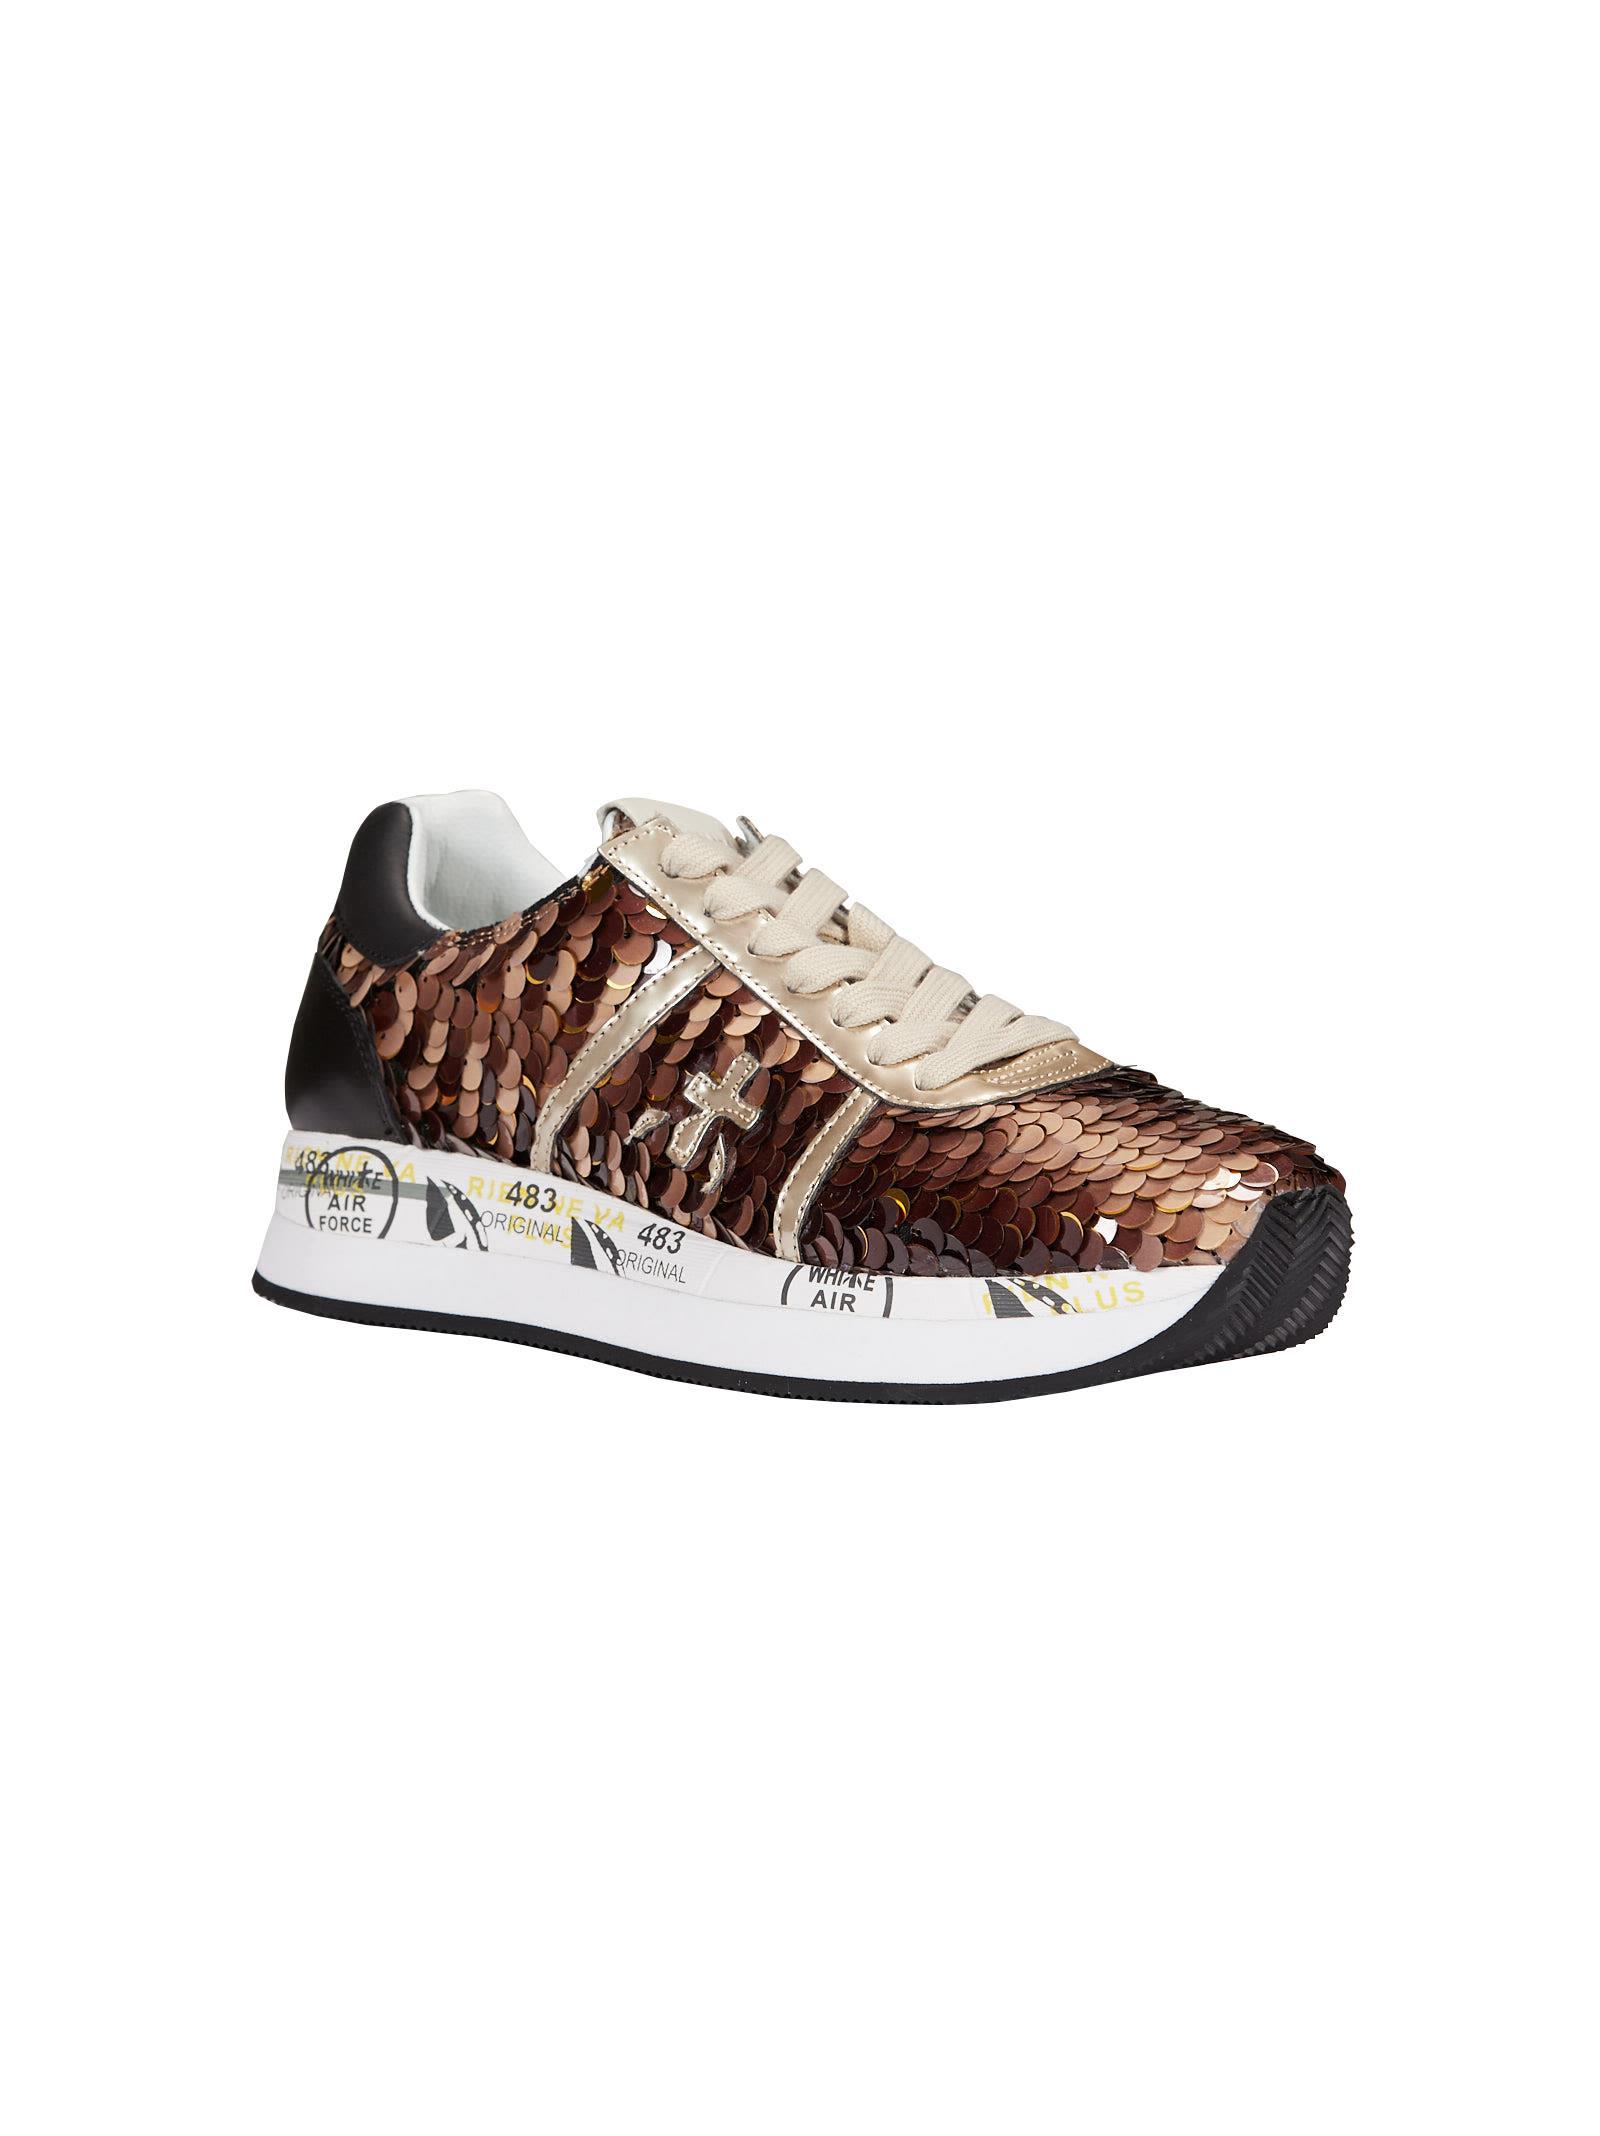 Huge Surprise Online Conny brown sneakers Premiata Outlet Amazing Price Free Shipping Discount Sale Original Cheap New Arrival zTz5FvLsSO